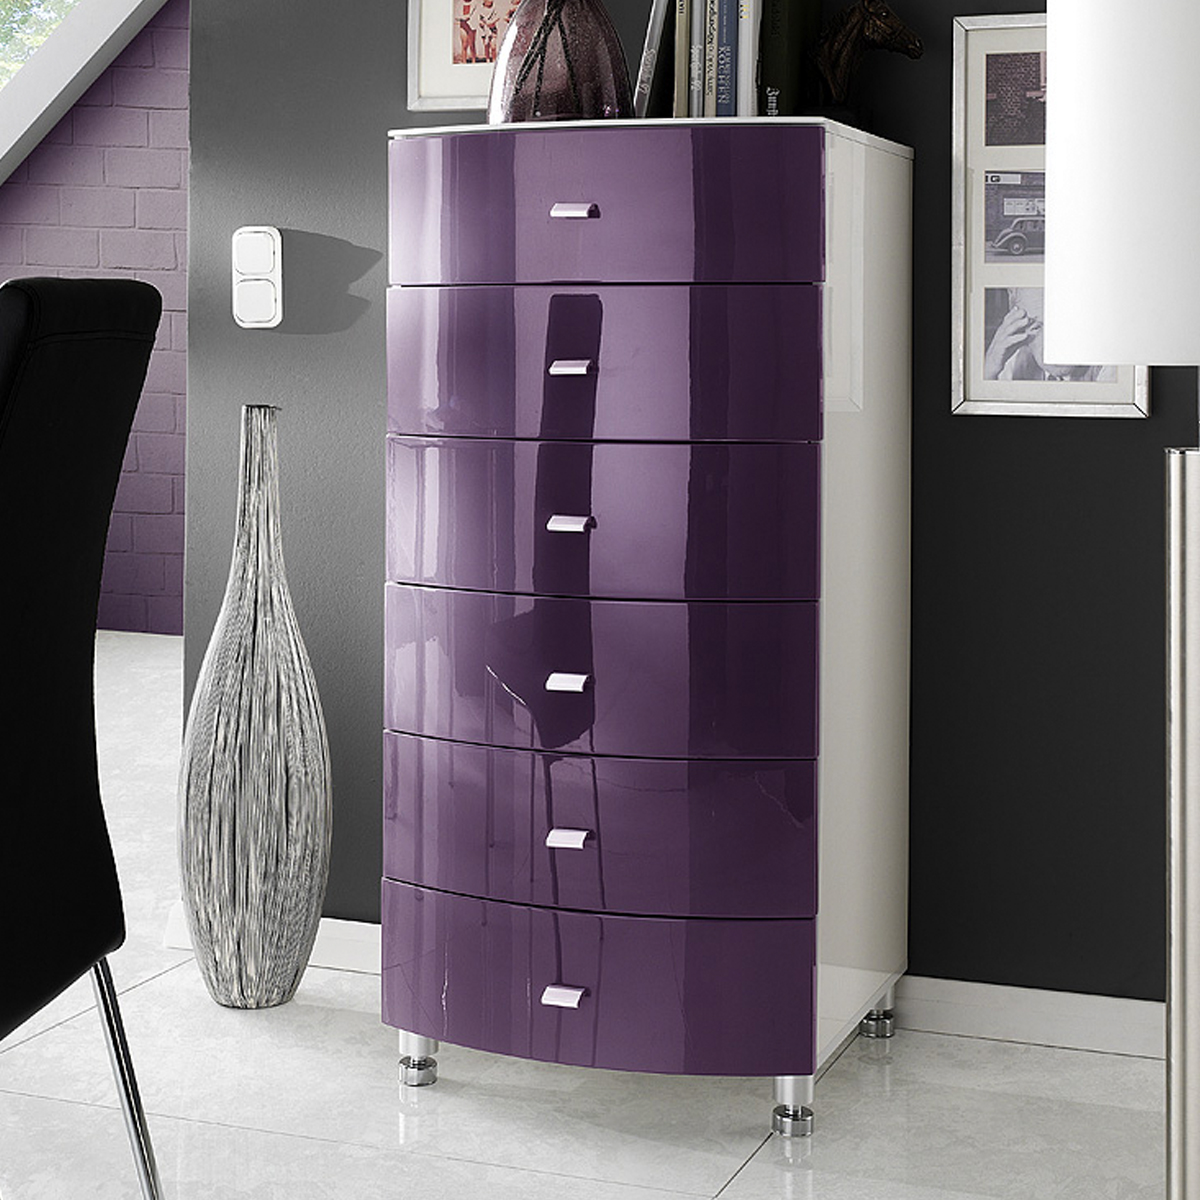 Kommode cappo sideboard wei lila hochglanz neu ebay for Kommode lila